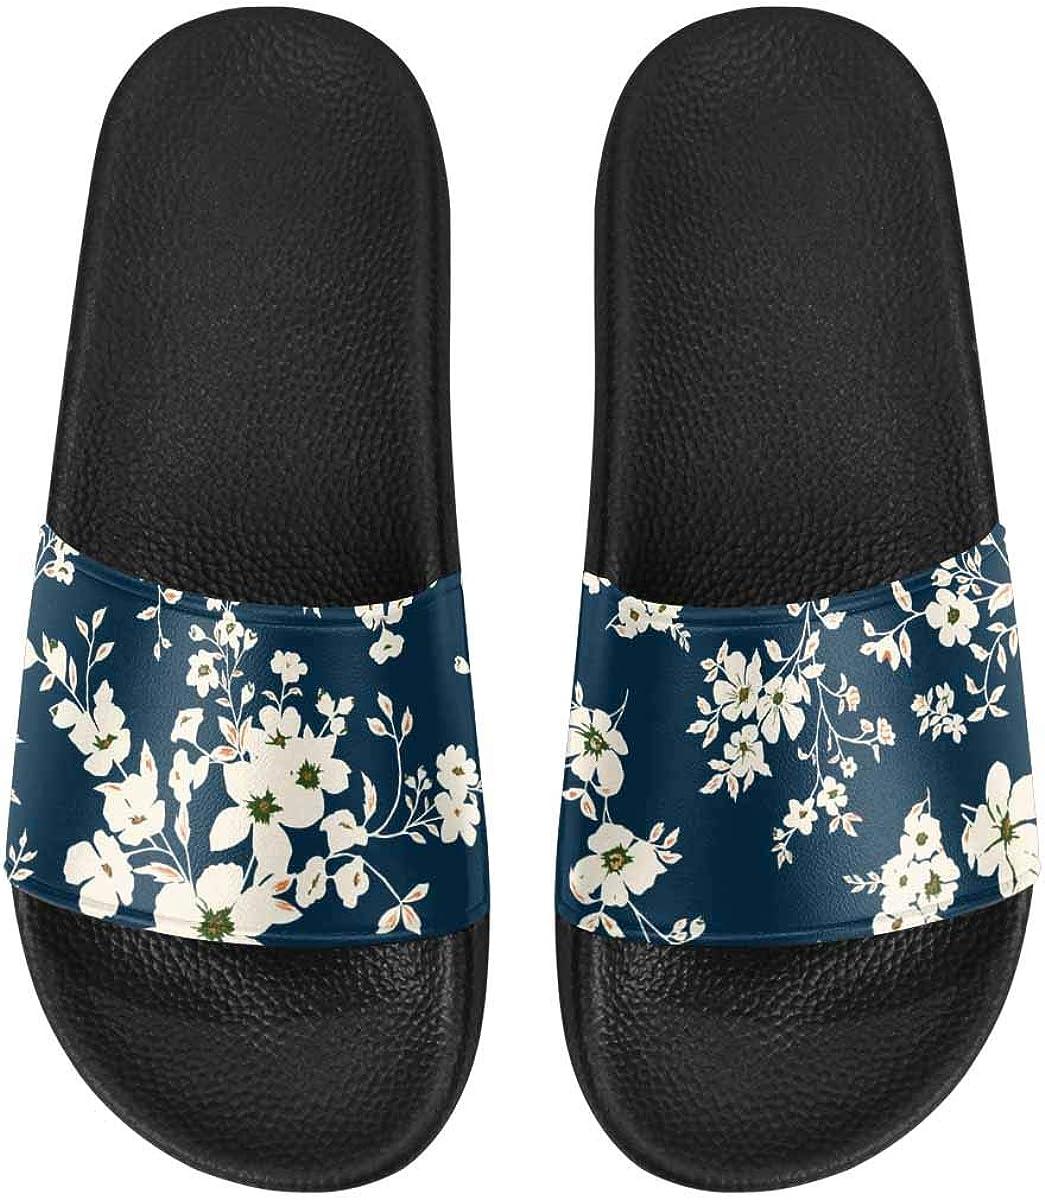 InterestPrint Women's Casual Slide Sandals for Indoor Outdoor Floral Leaves Autumn